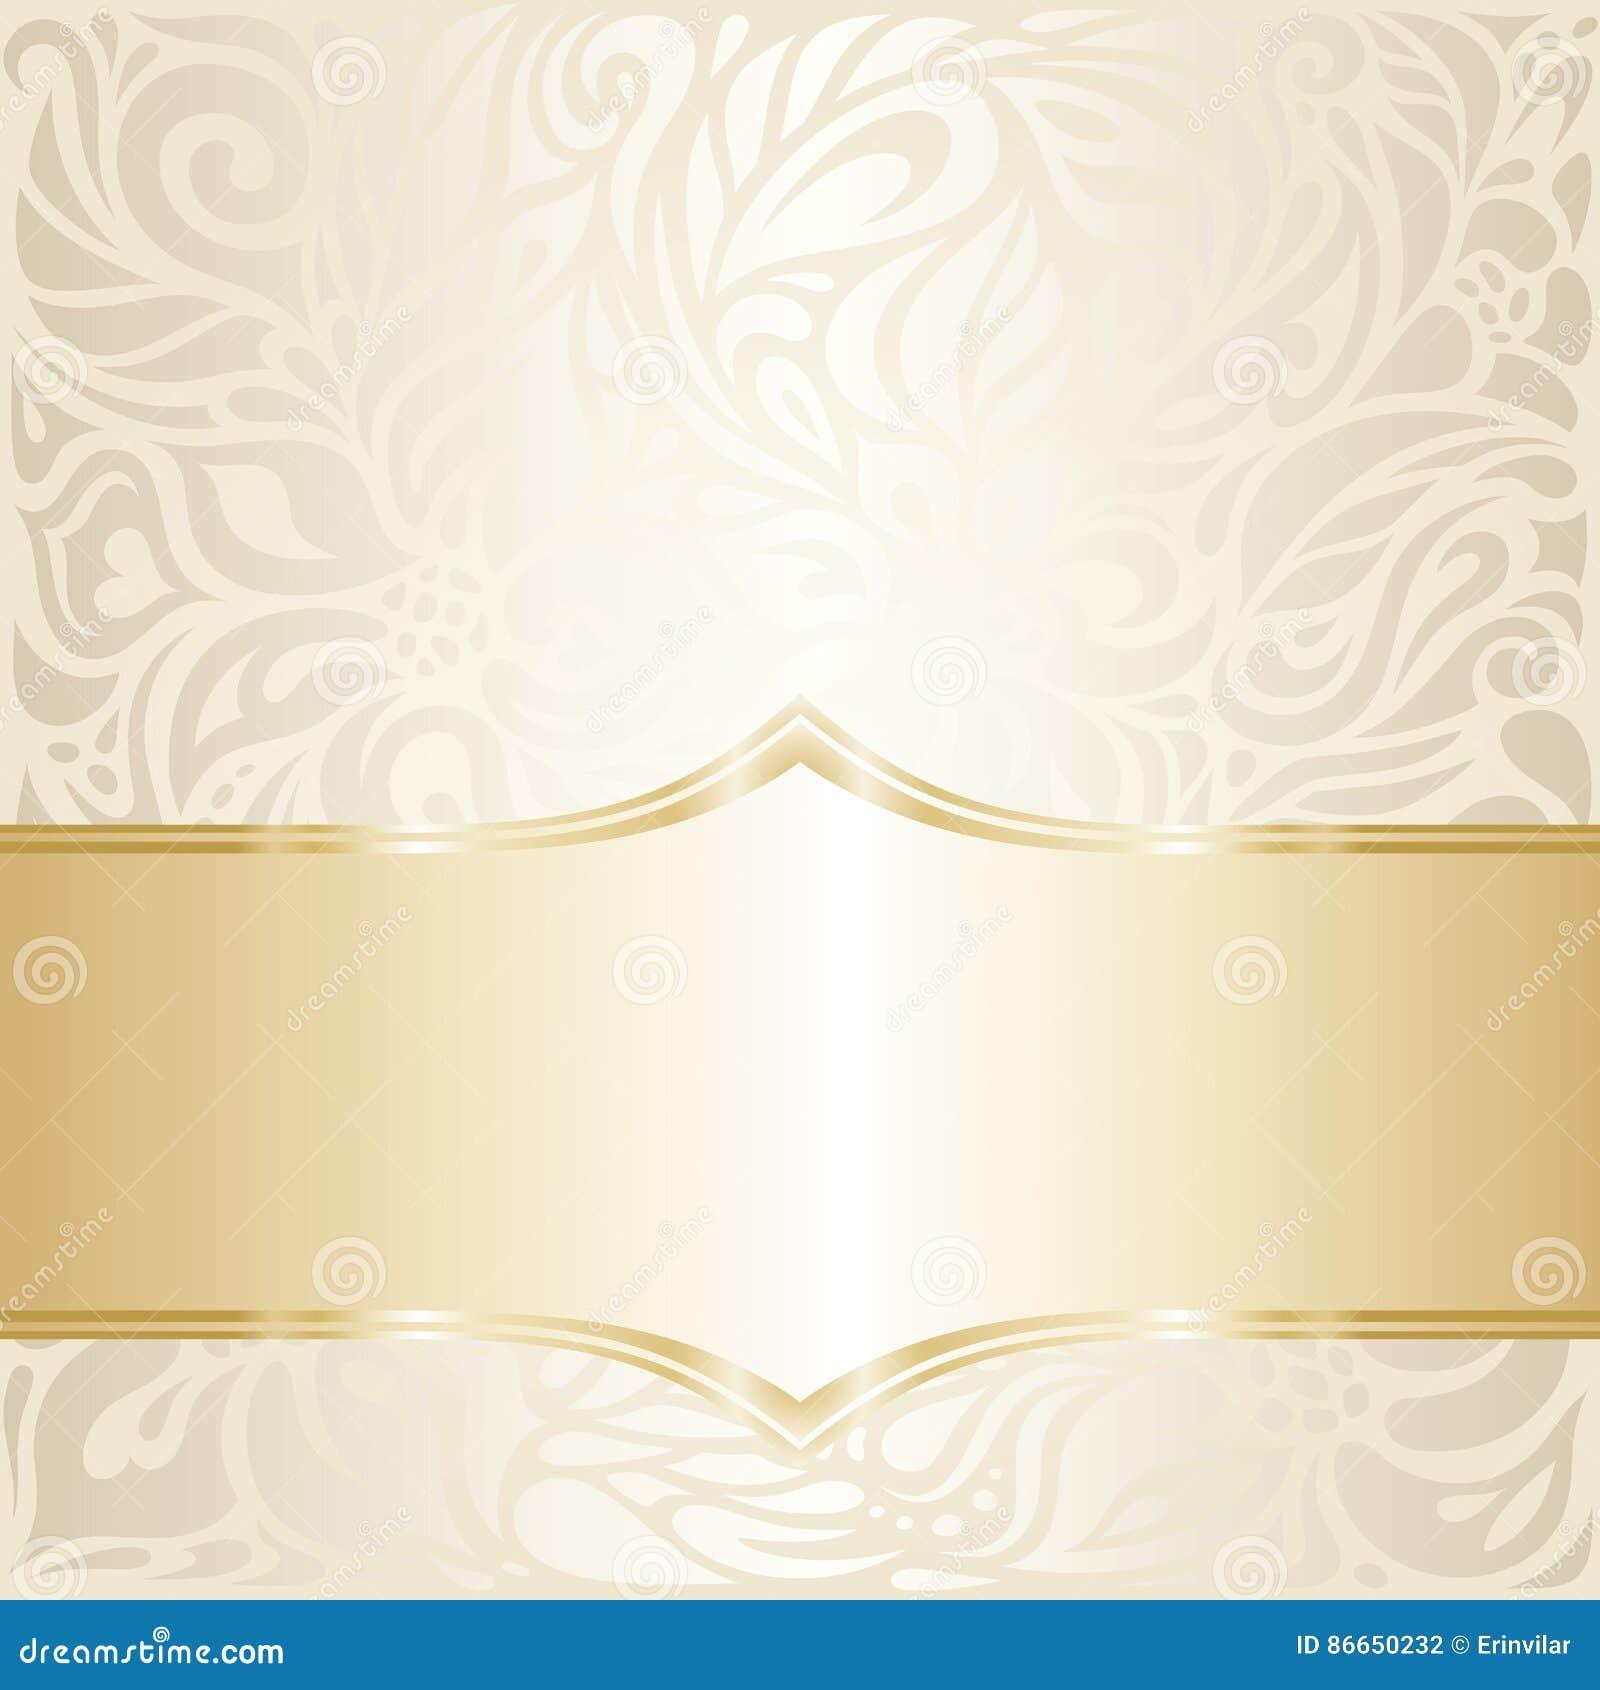 Floral Wedding Invitation Wallpaper Design In Ecru Royalty Free Vector Download